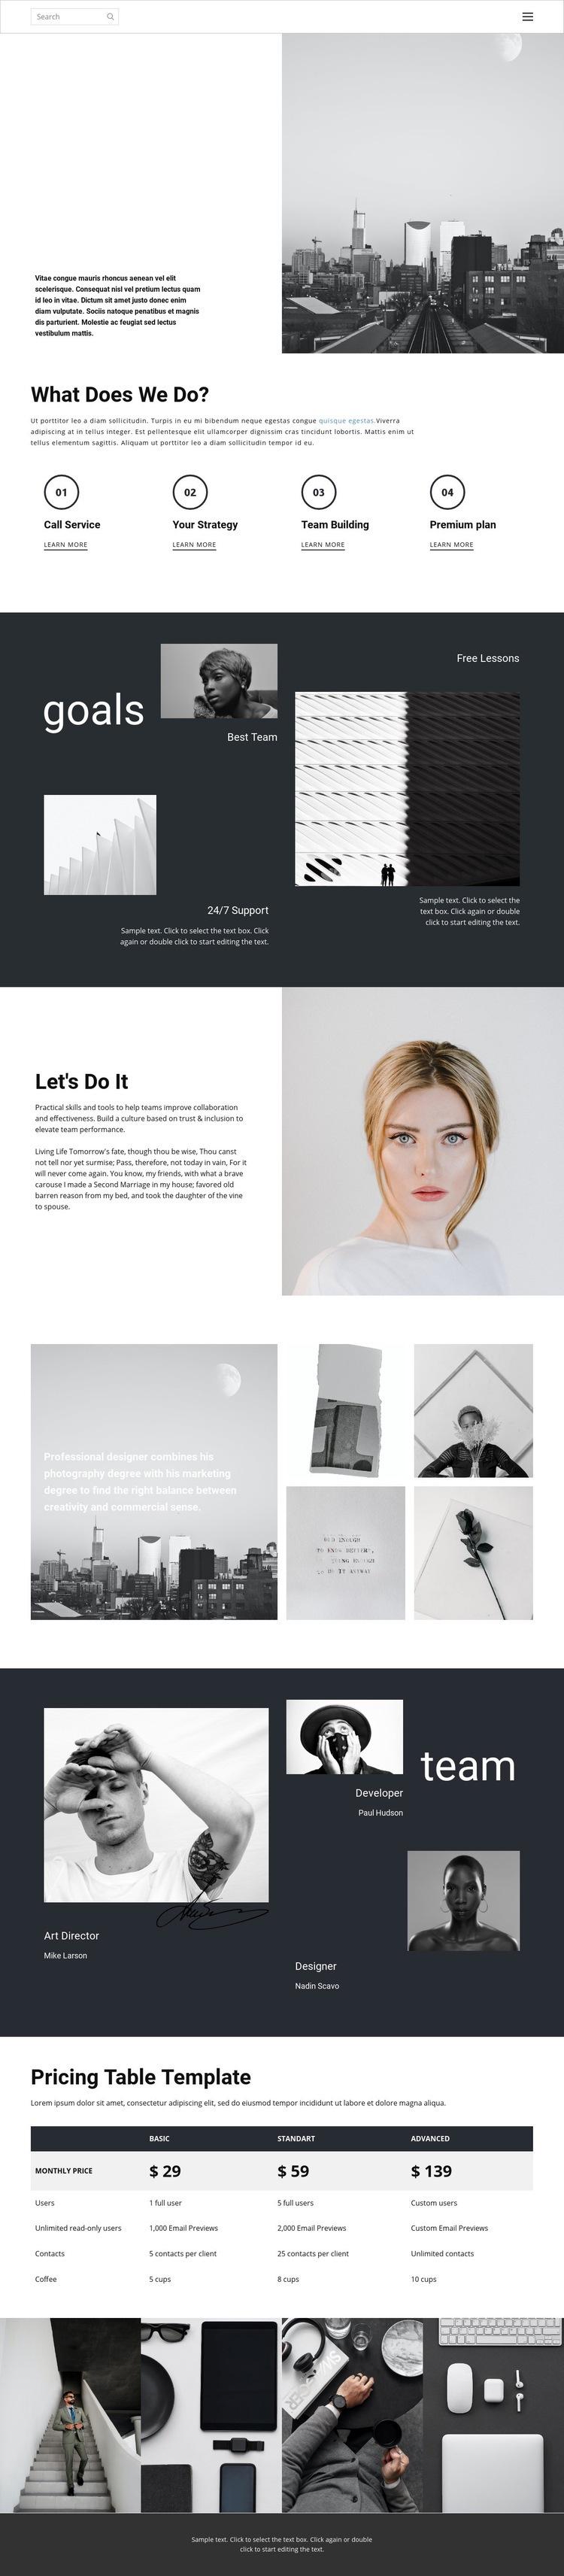 Business promotion agency Web Page Designer